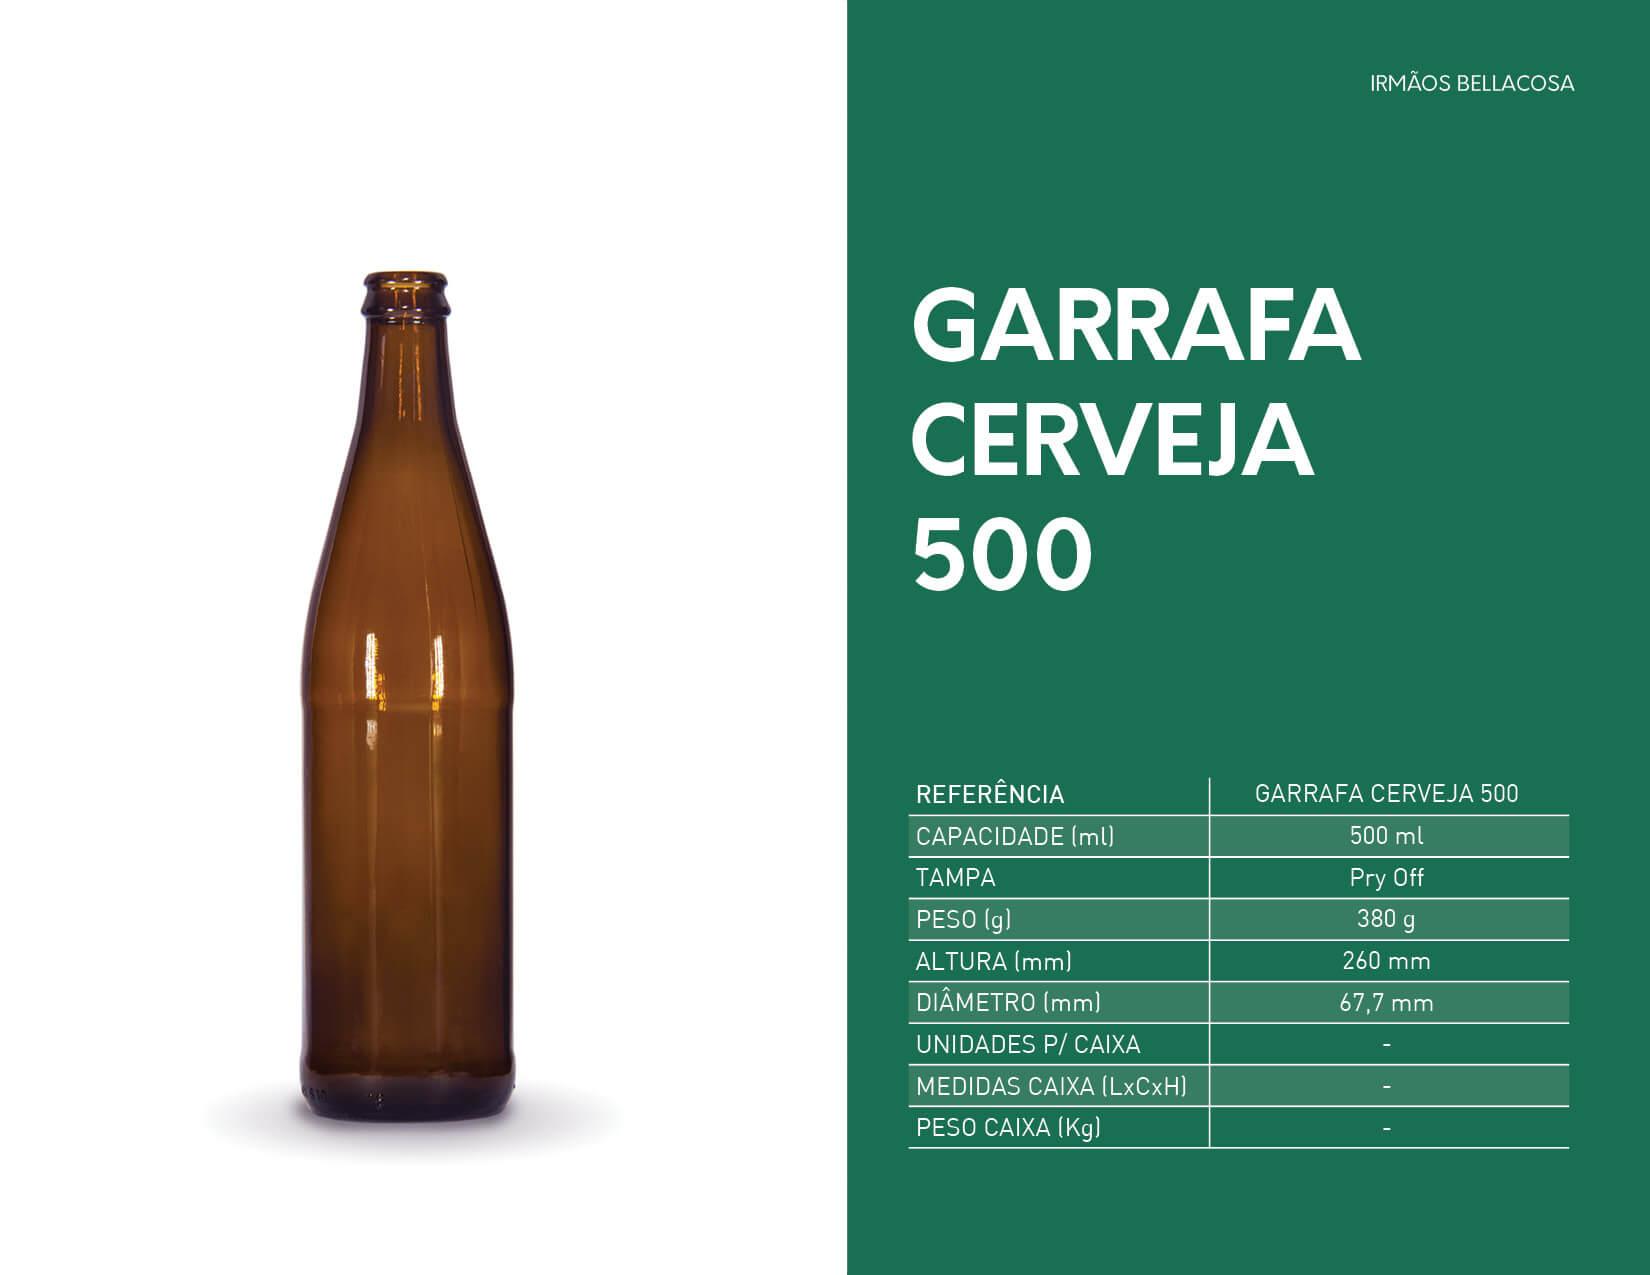 051-Garrafa-Cerveja-500-irmaos-bellacosa-embalagens-de-vidro